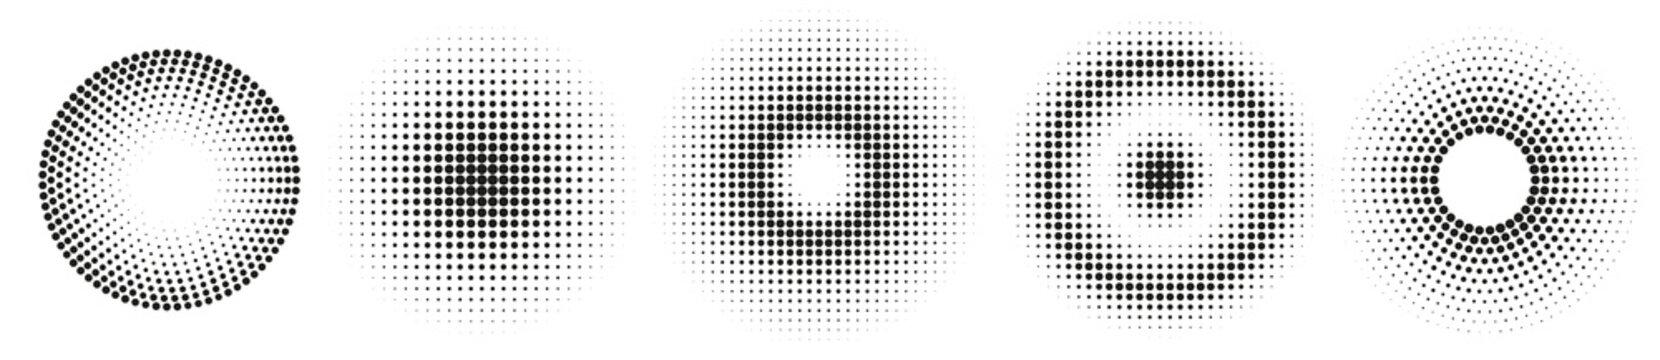 Set of simple halftones. Black gradient circles of dots. Dotwork. Vector illustration